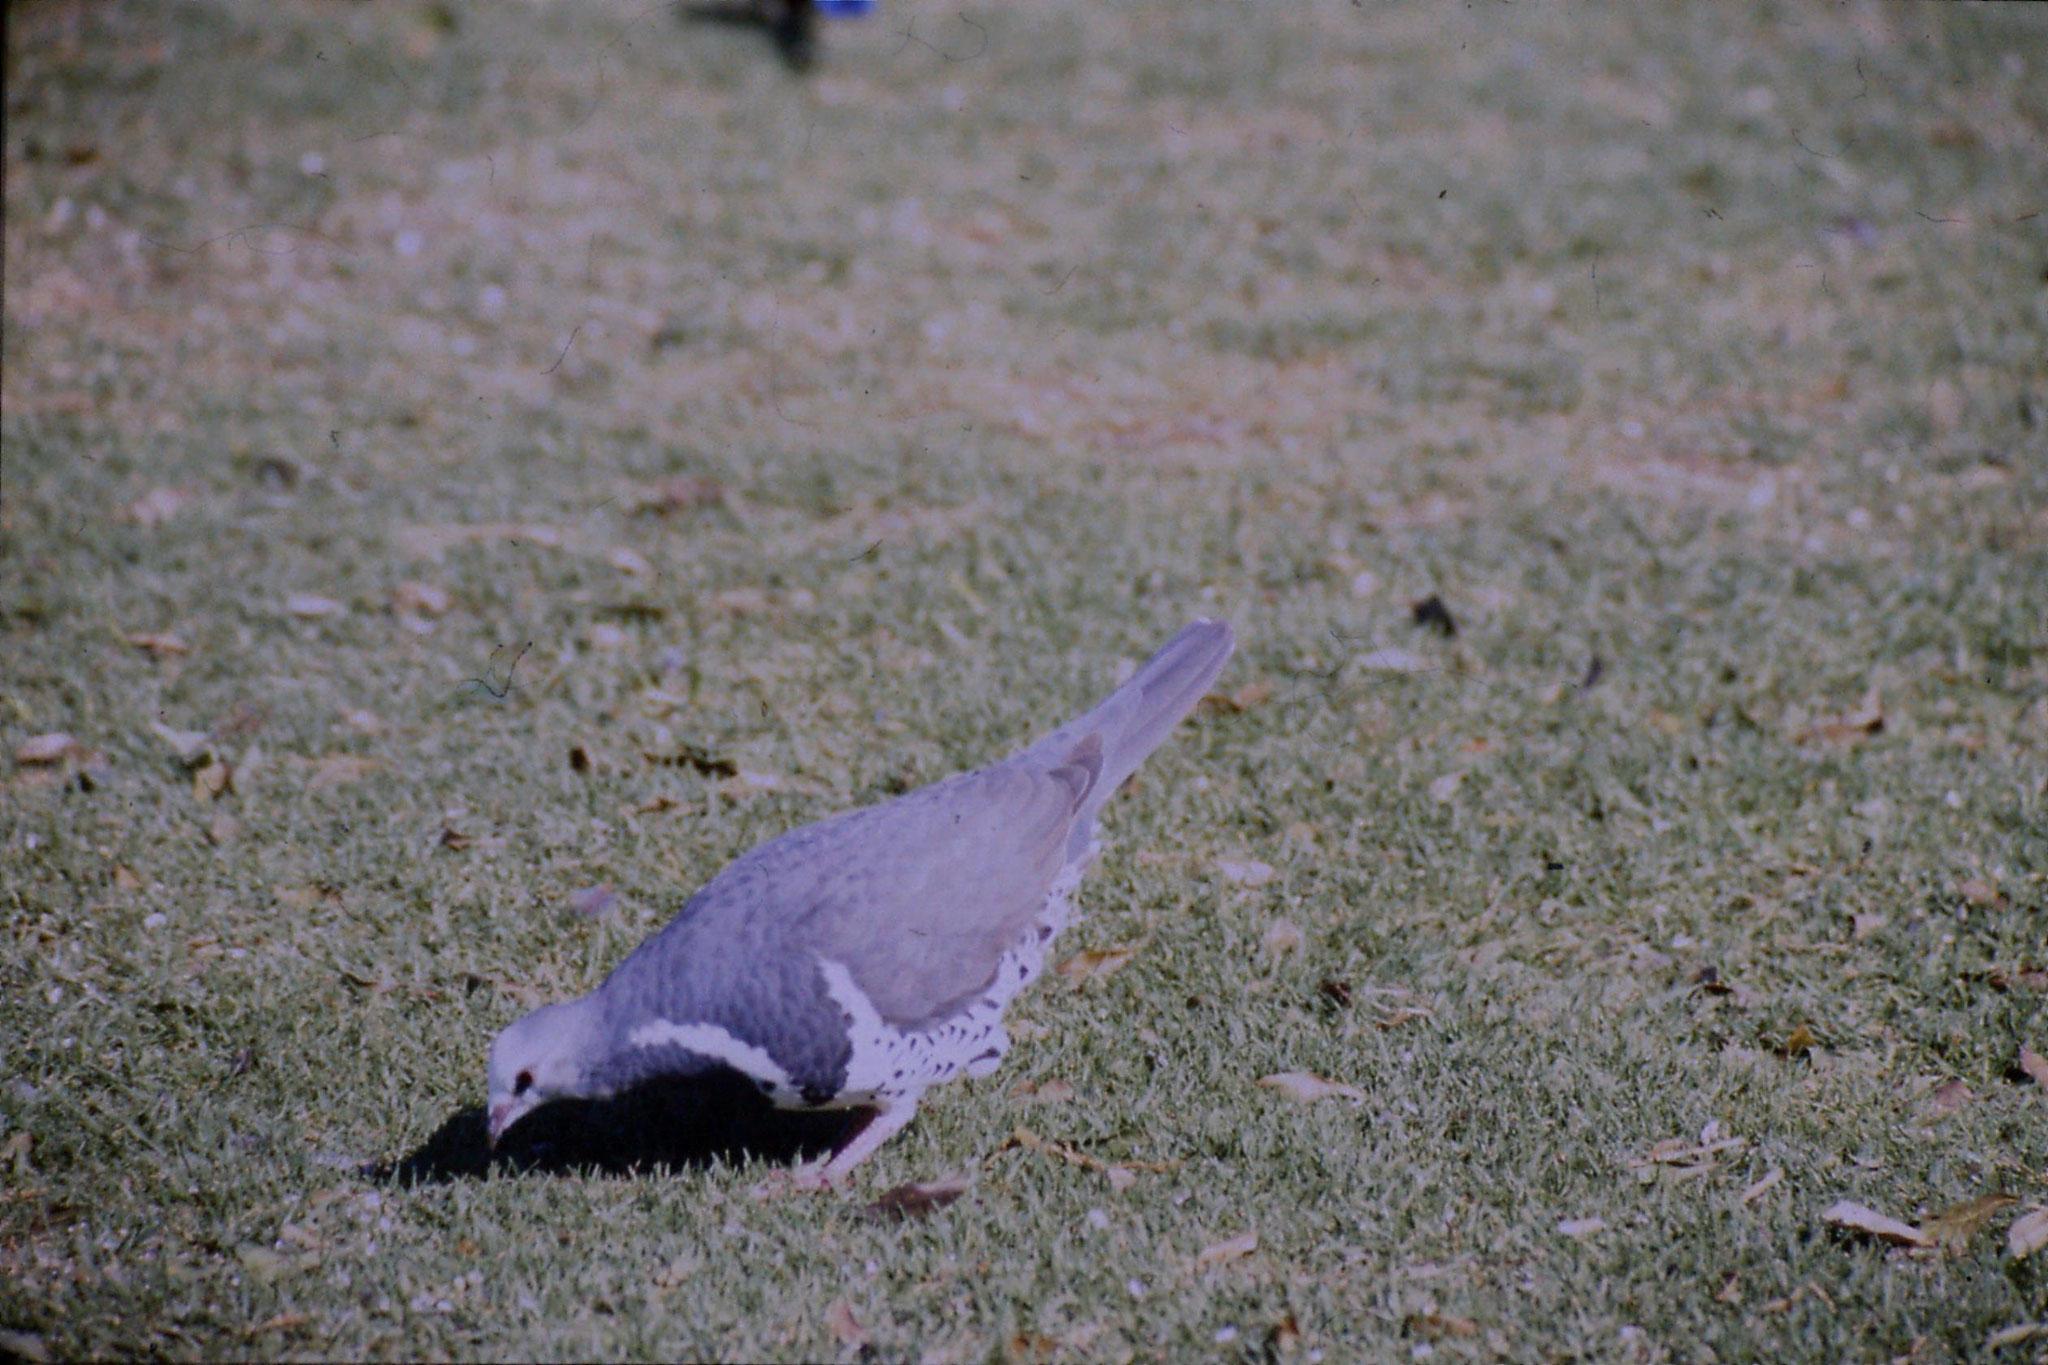 12/10/1990: 33: Lamington Nat. Pk., Wonga pigeon